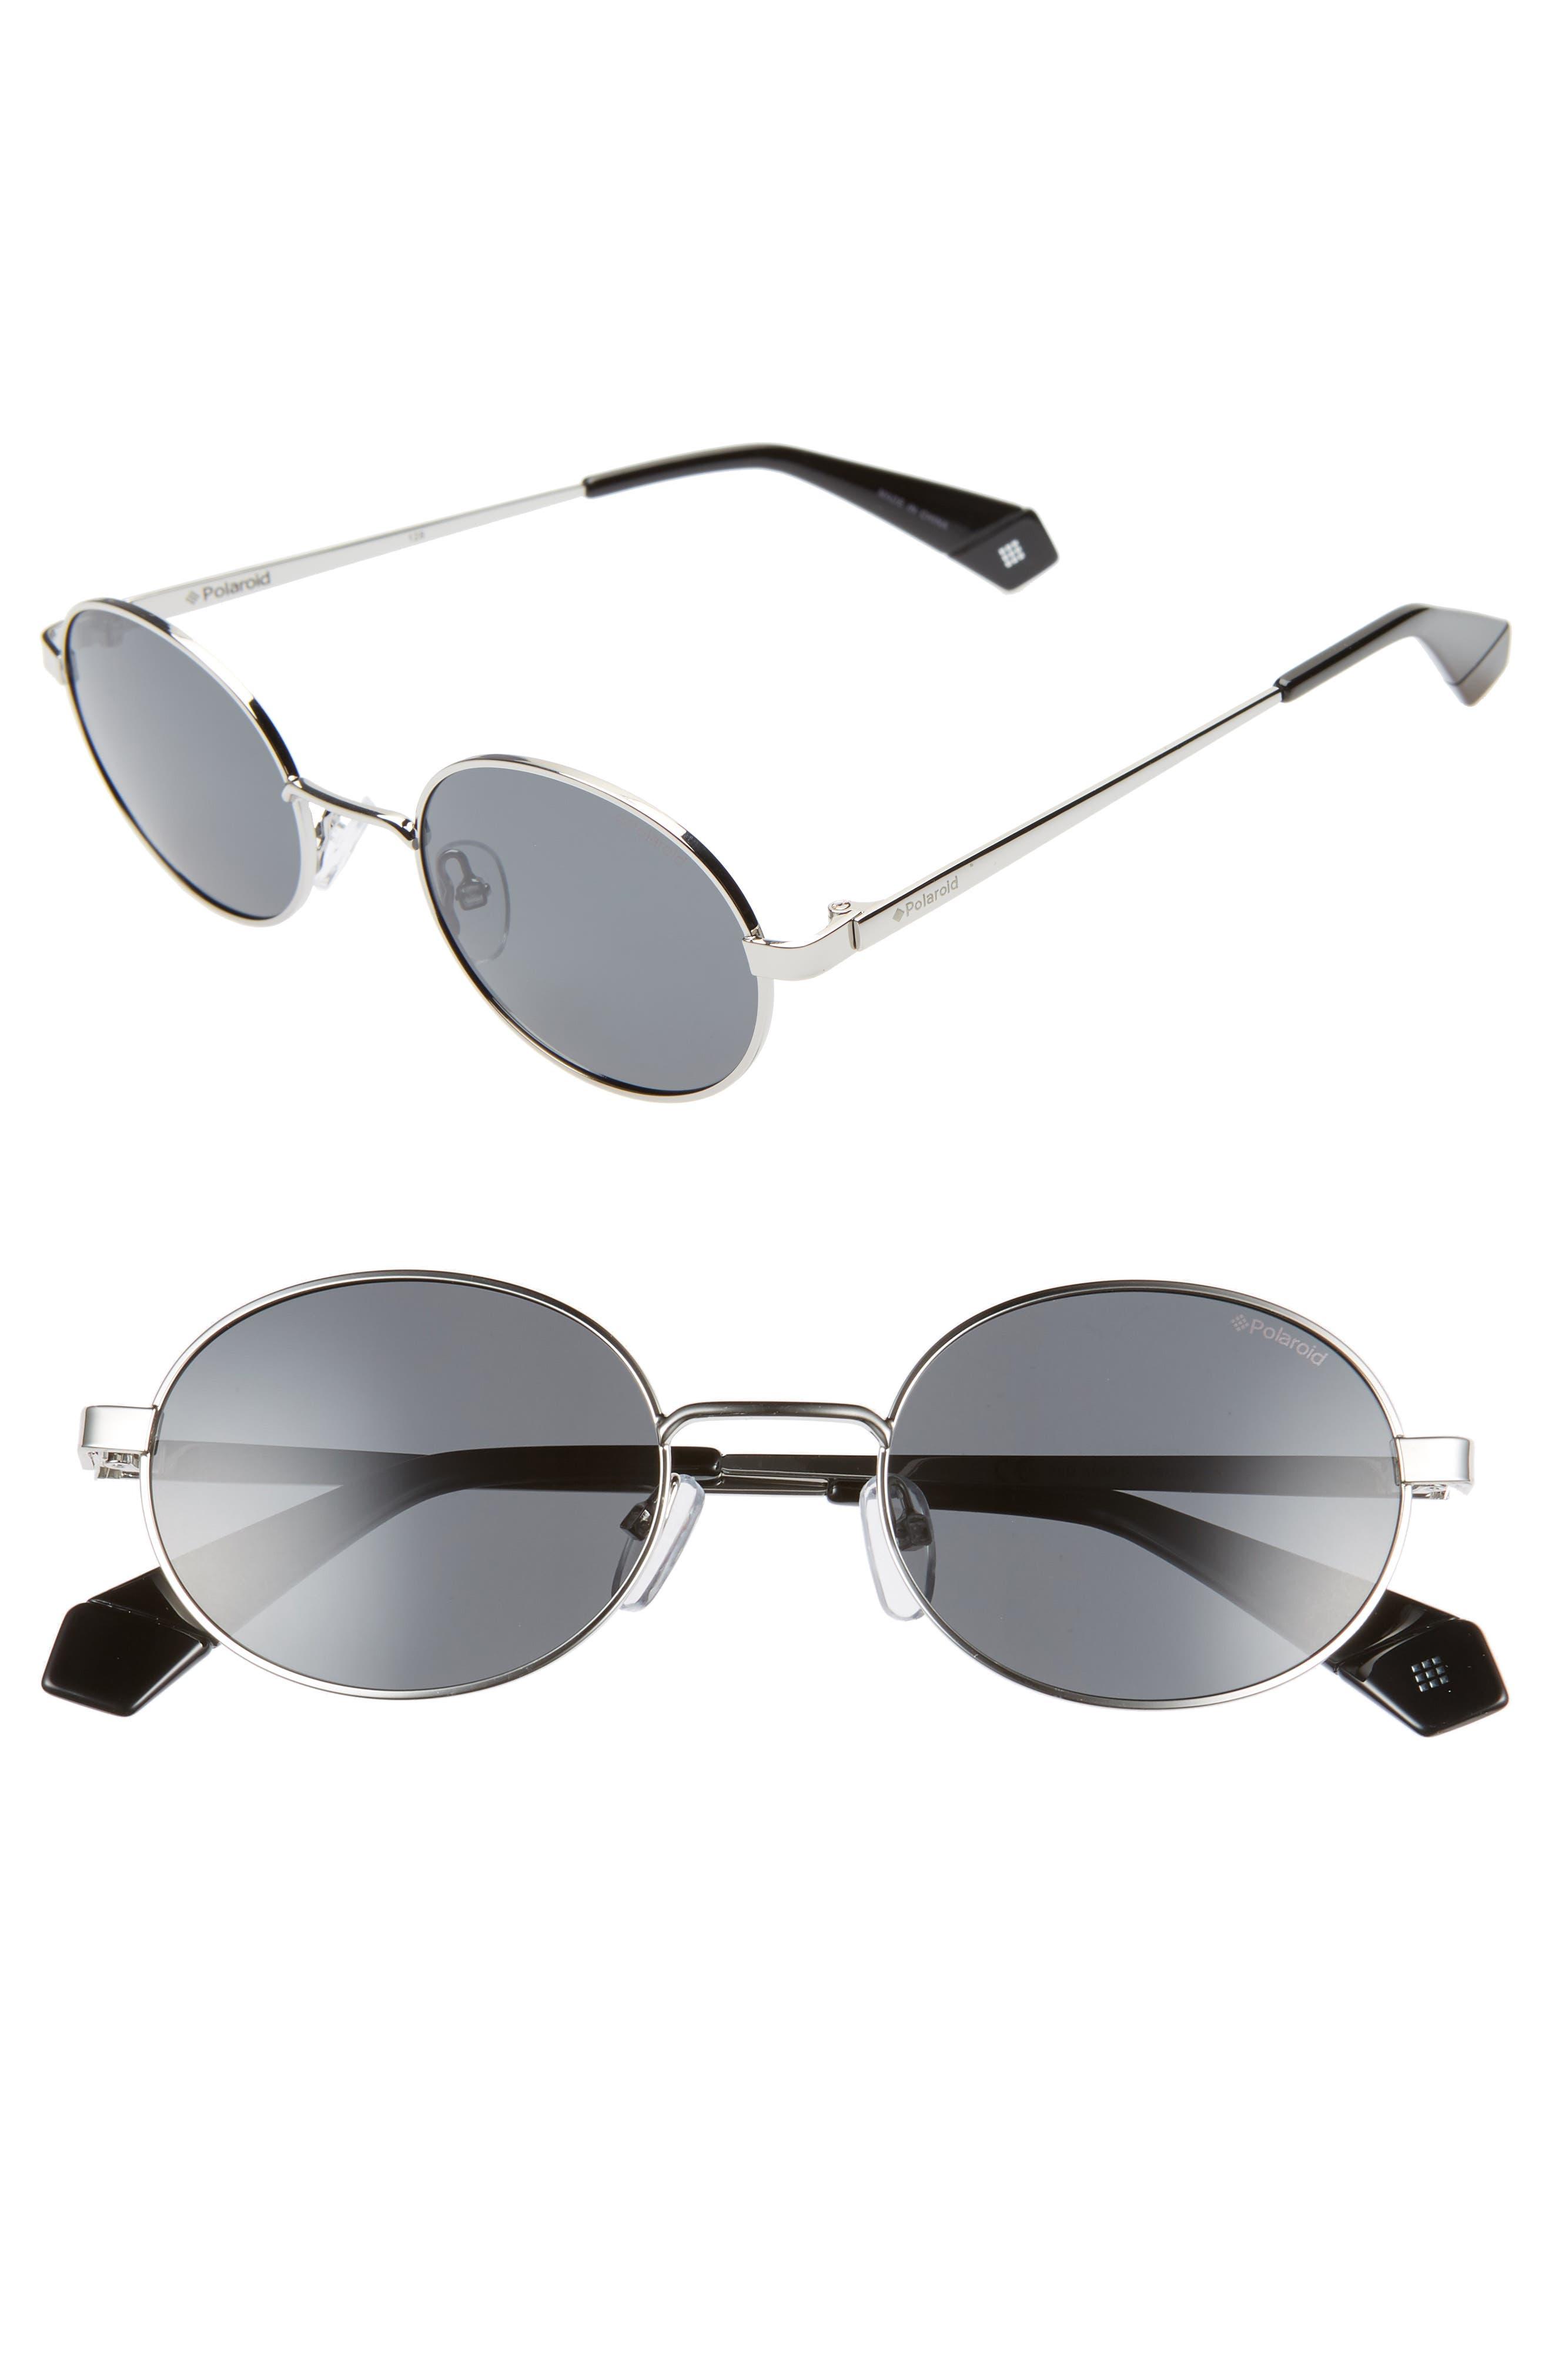 Polaroid 51Mm Polarized Round Sunglasses - Silver/ Black